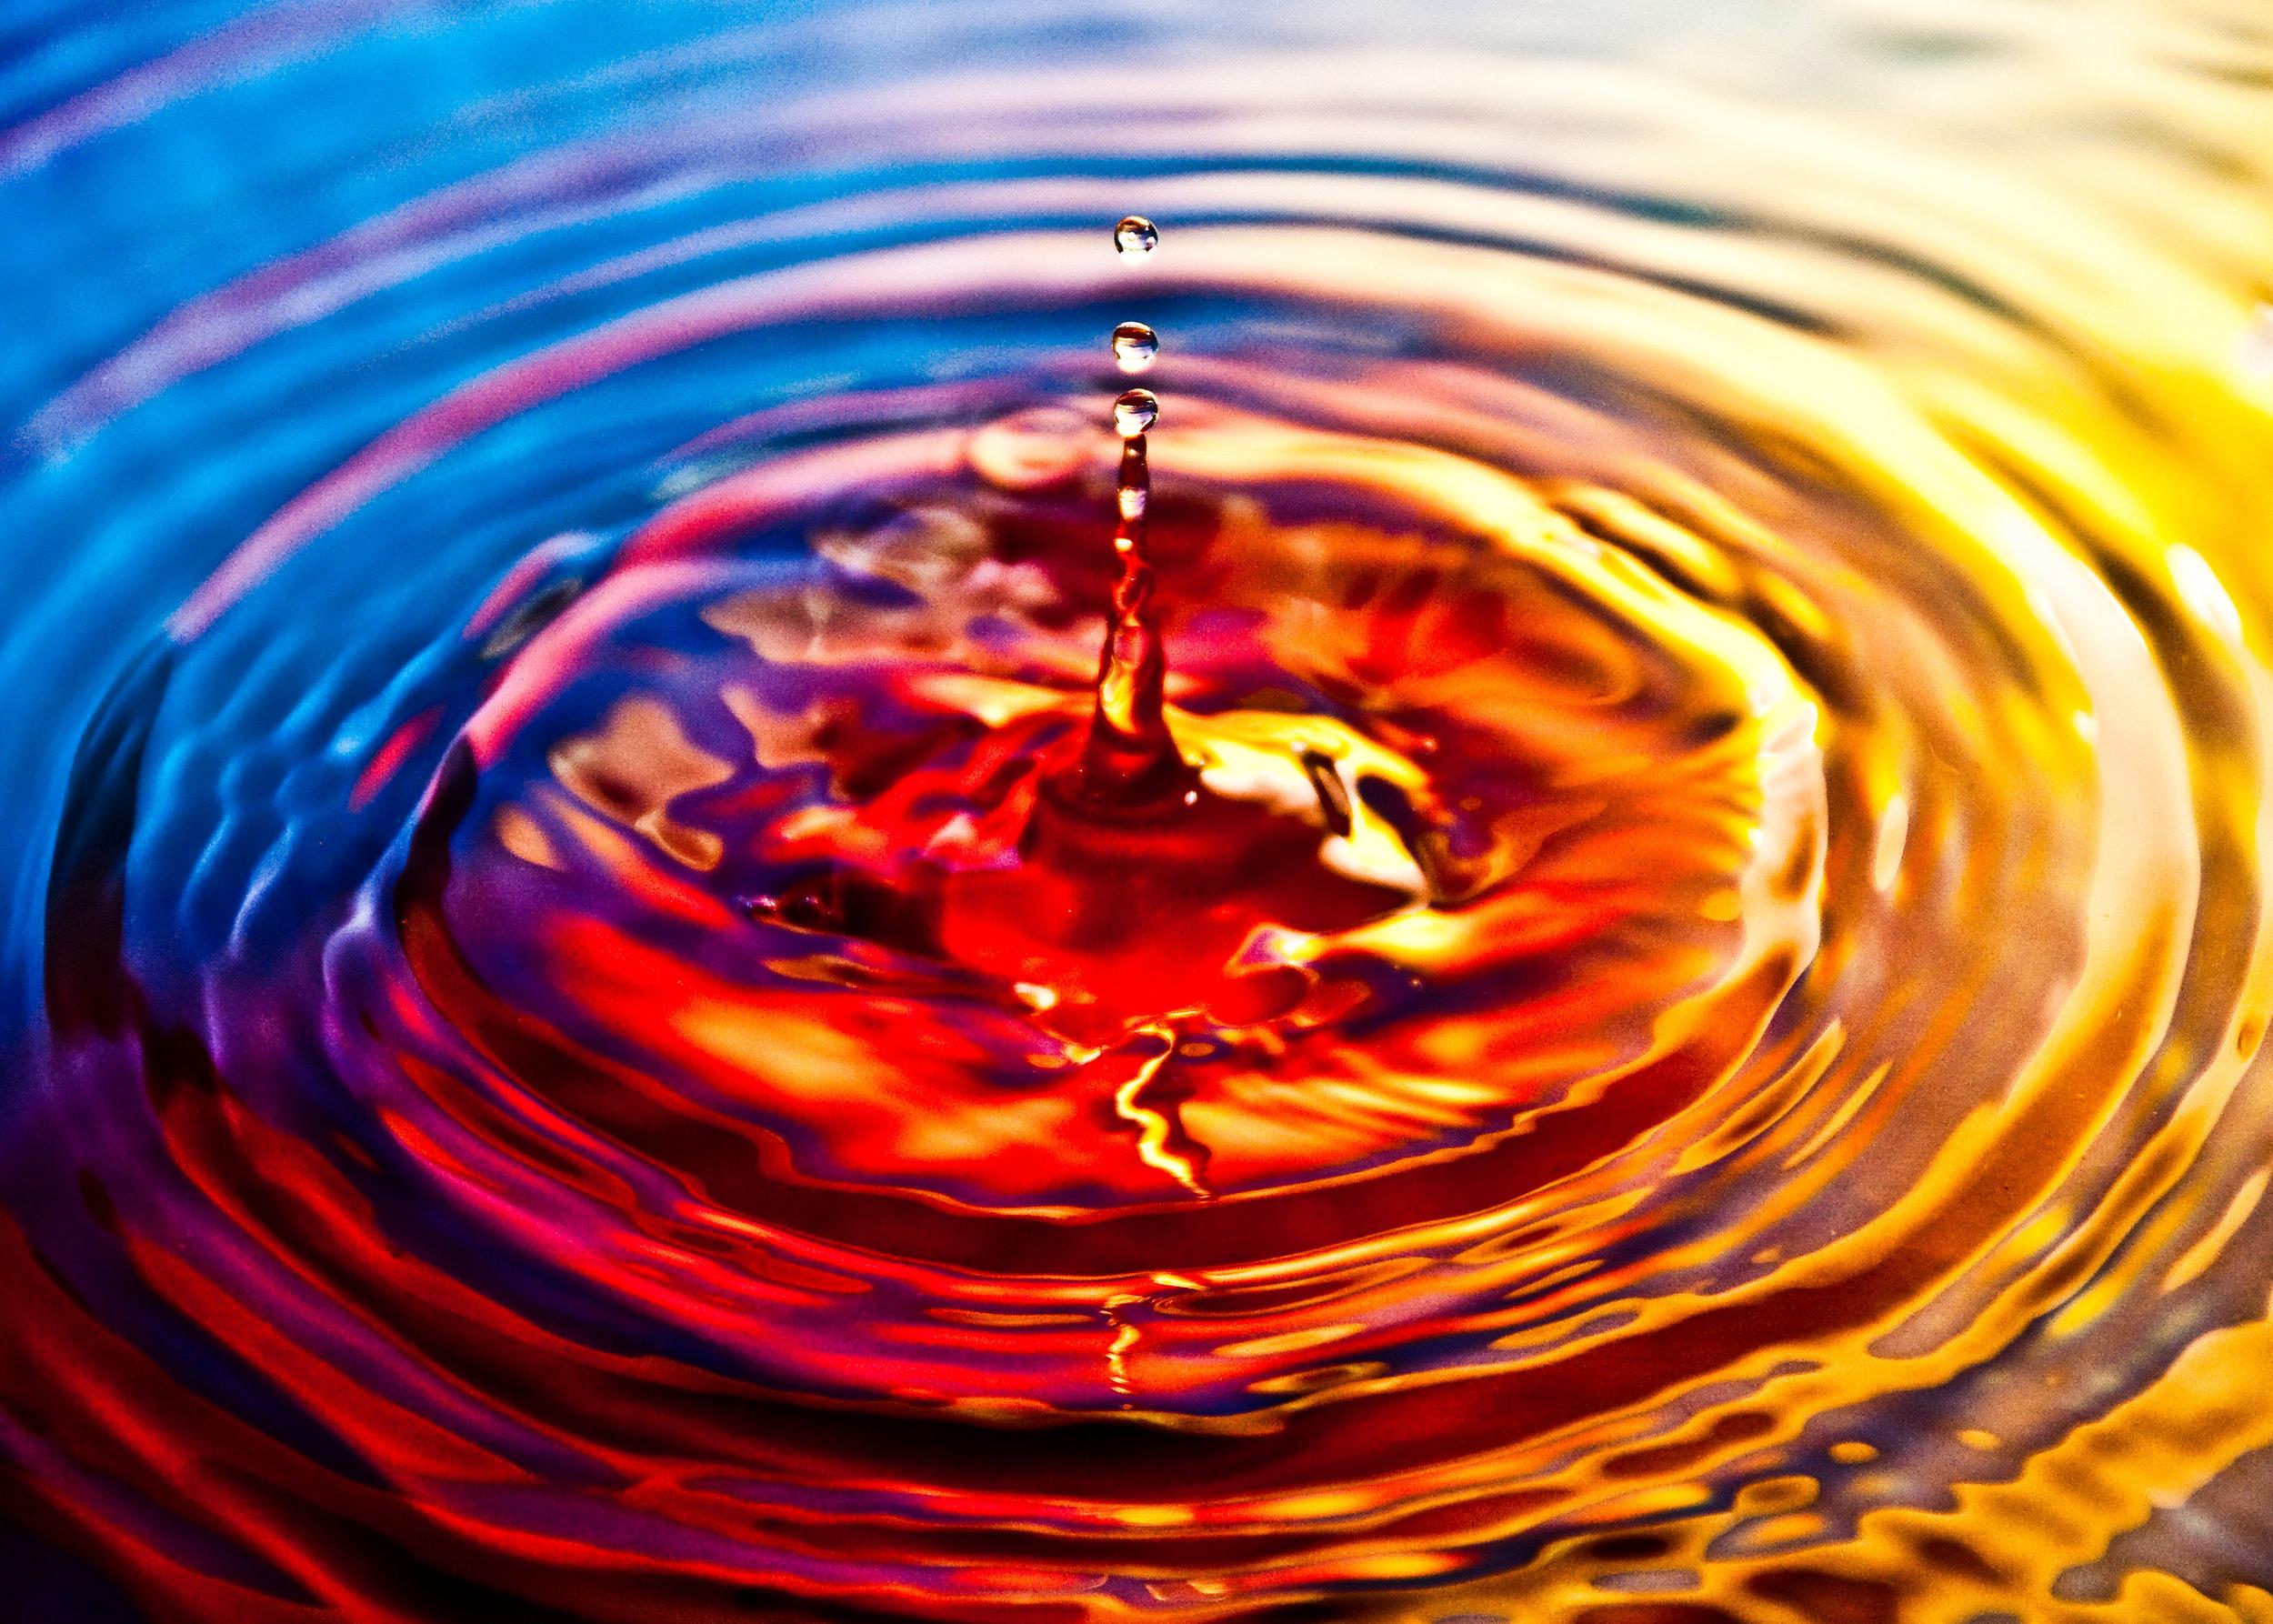 Ripple_effect_on_water.jpg